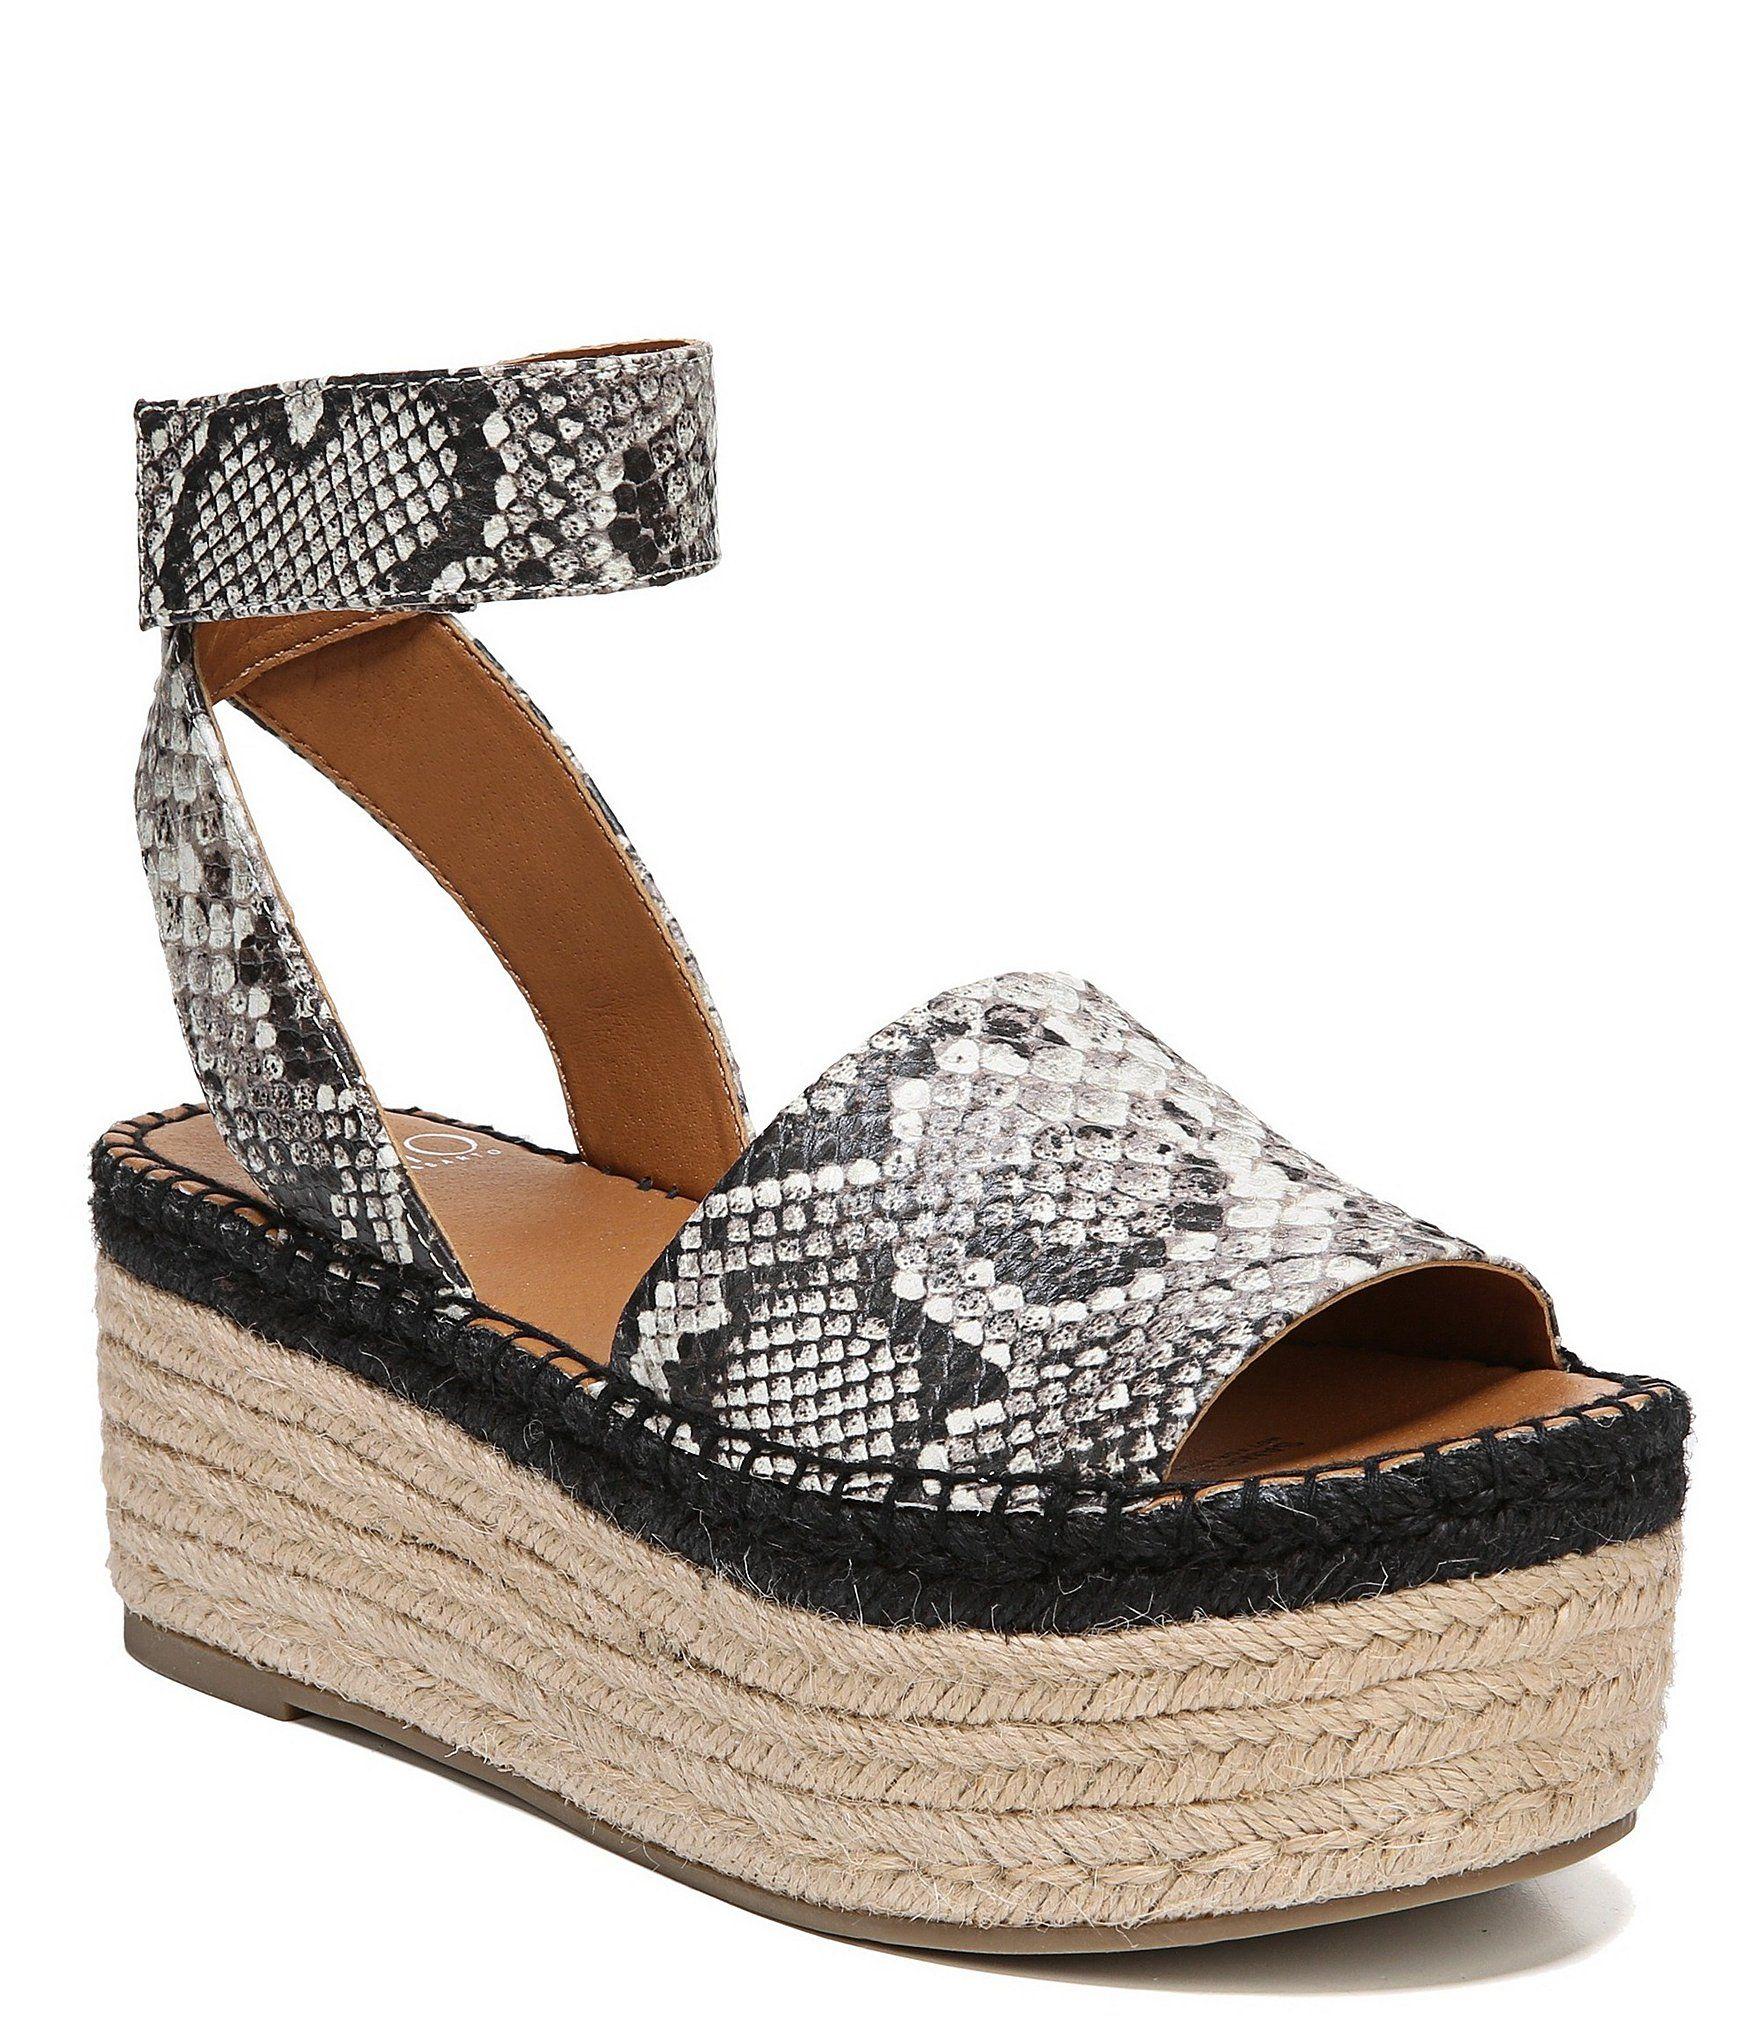 Sarto by Franco Sarto Maisi Ankle Strap Espadrille Sandals XTbCwl0